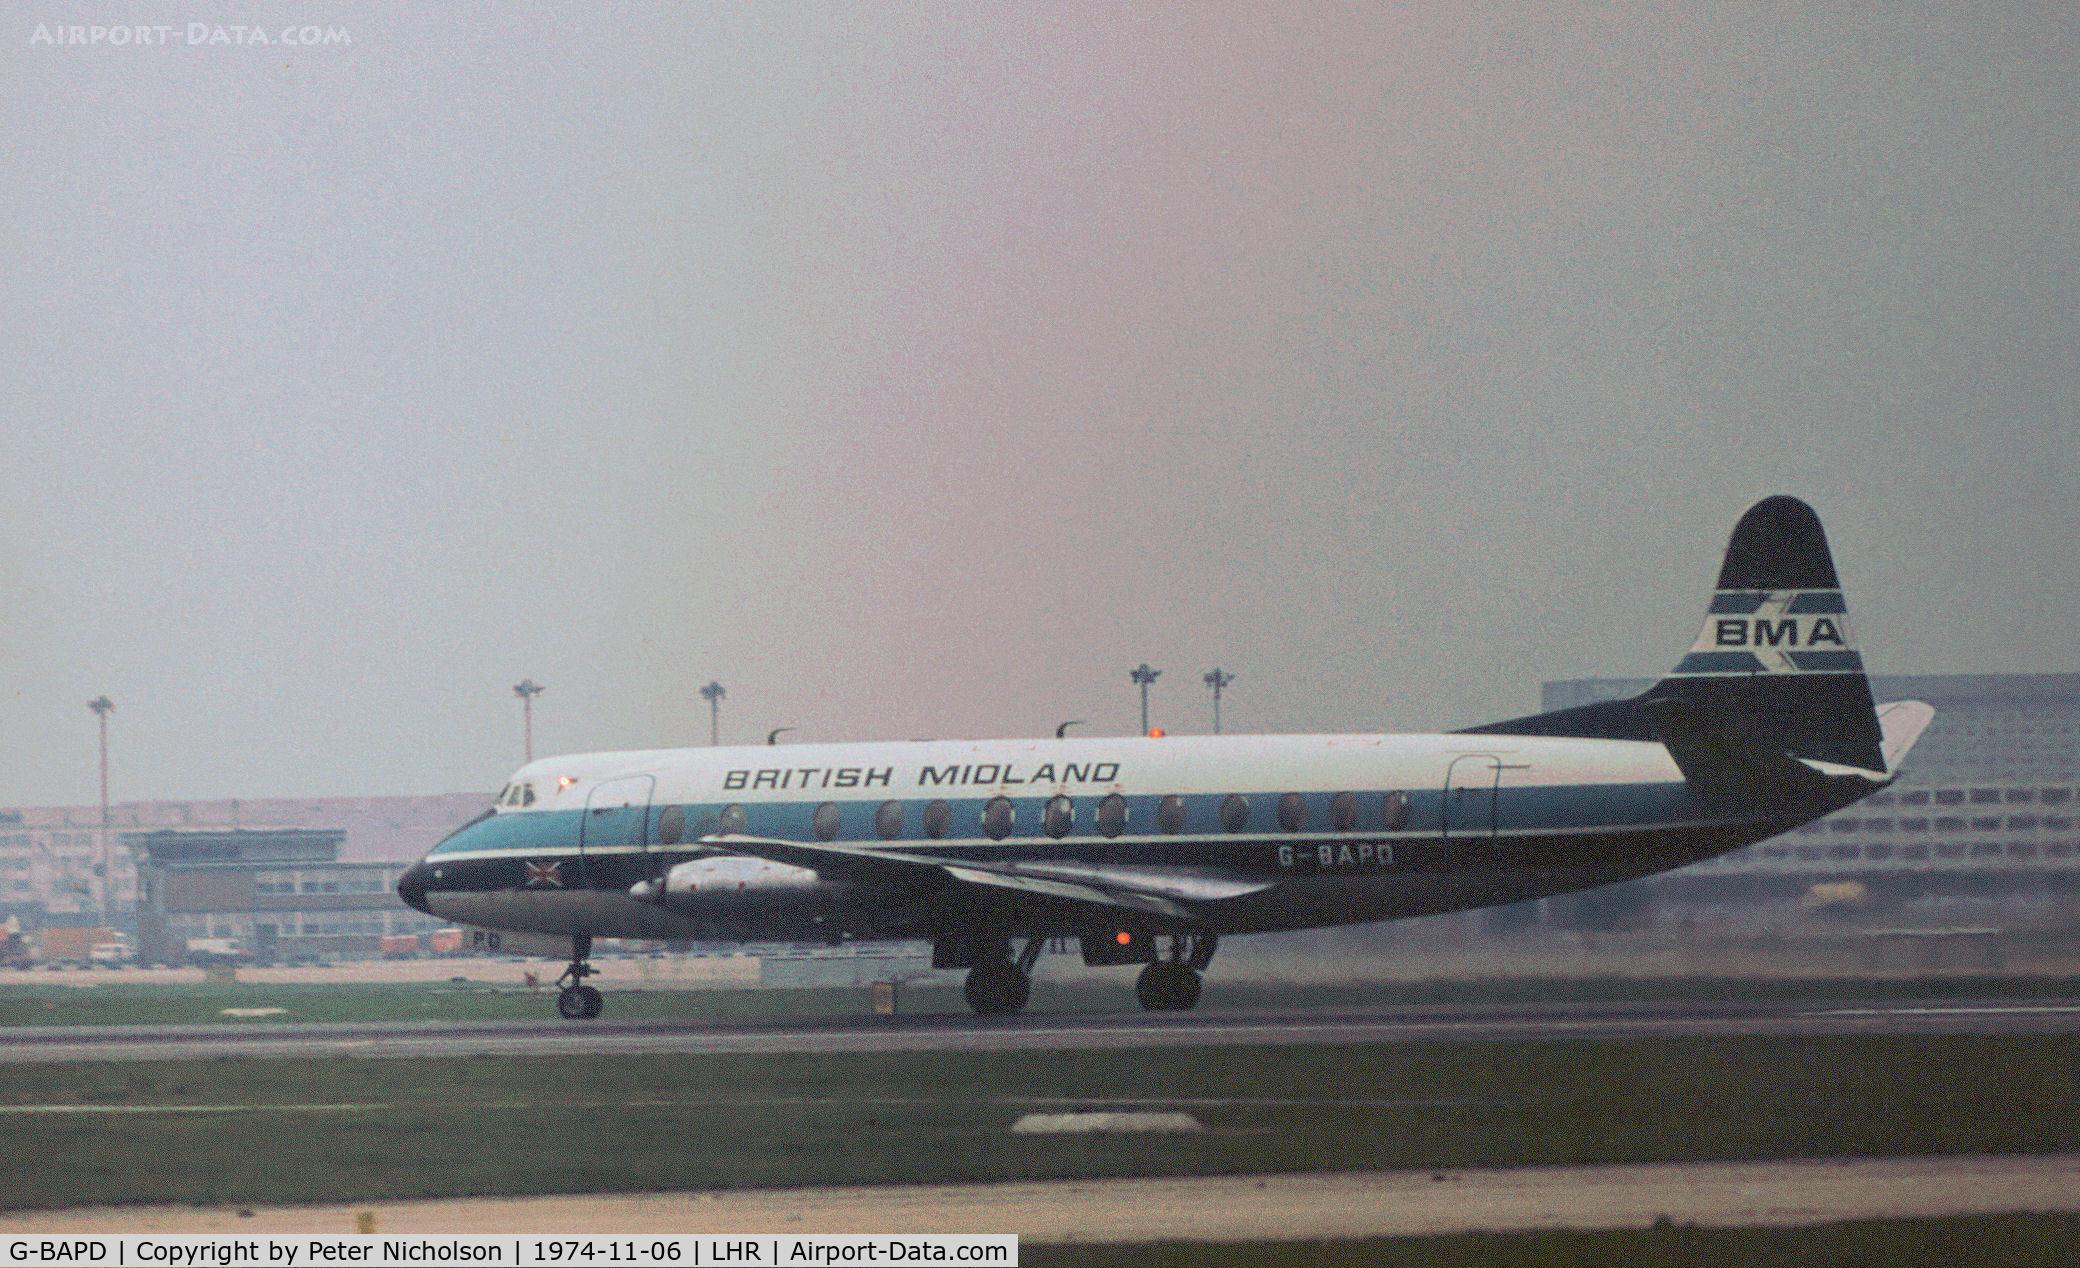 G-BAPD, 1958 Vickers Viscount 814 C/N 340, Viscount 814 of British Midland Airways preparing for take-off on Runway 27L at Heathrow in November 1974.